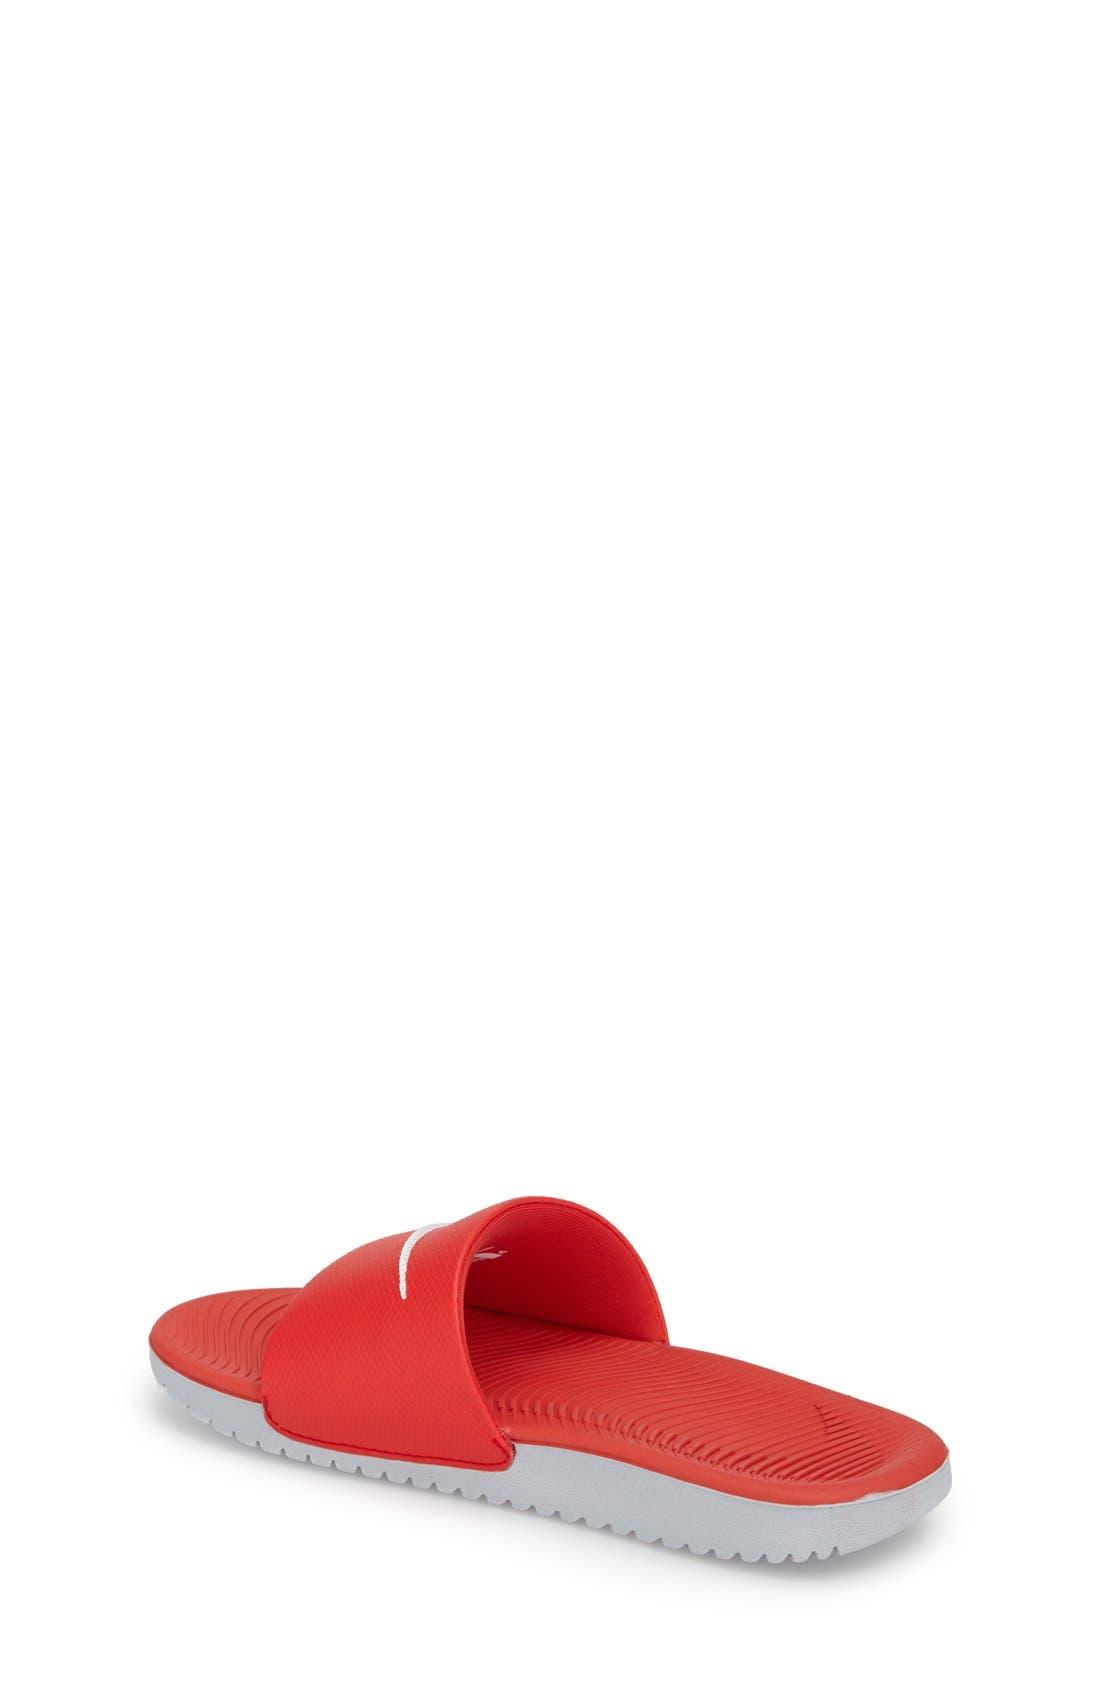 'Kawa' Slide Sandal,                             Alternate thumbnail 2, color,                             University Red/ White